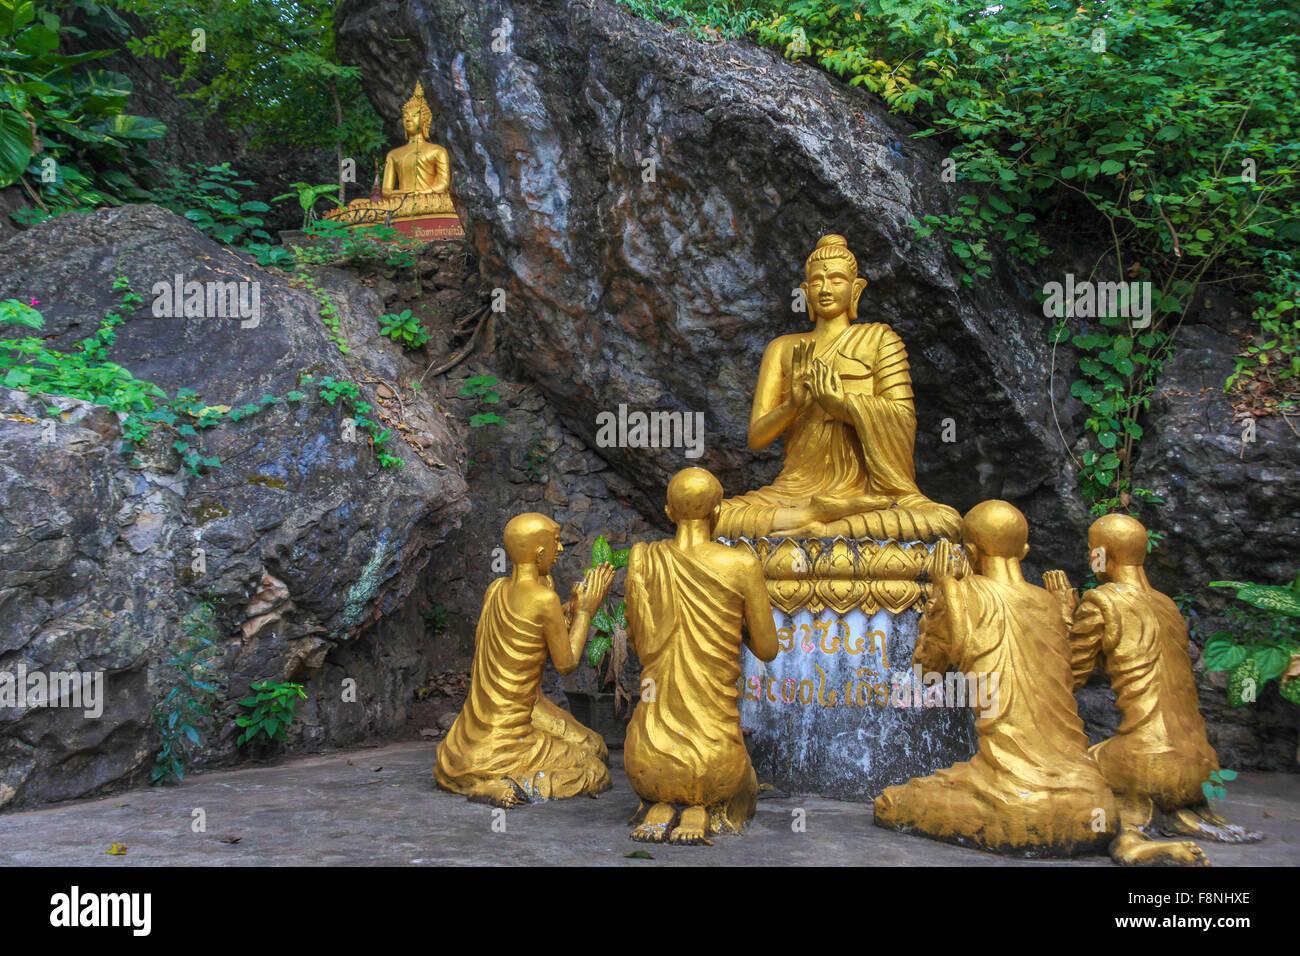 Buddha and his disciples, Buddha statue on Phousi Mountain, Luang Prabang, Laos, Indochina, Asia Stock Photo